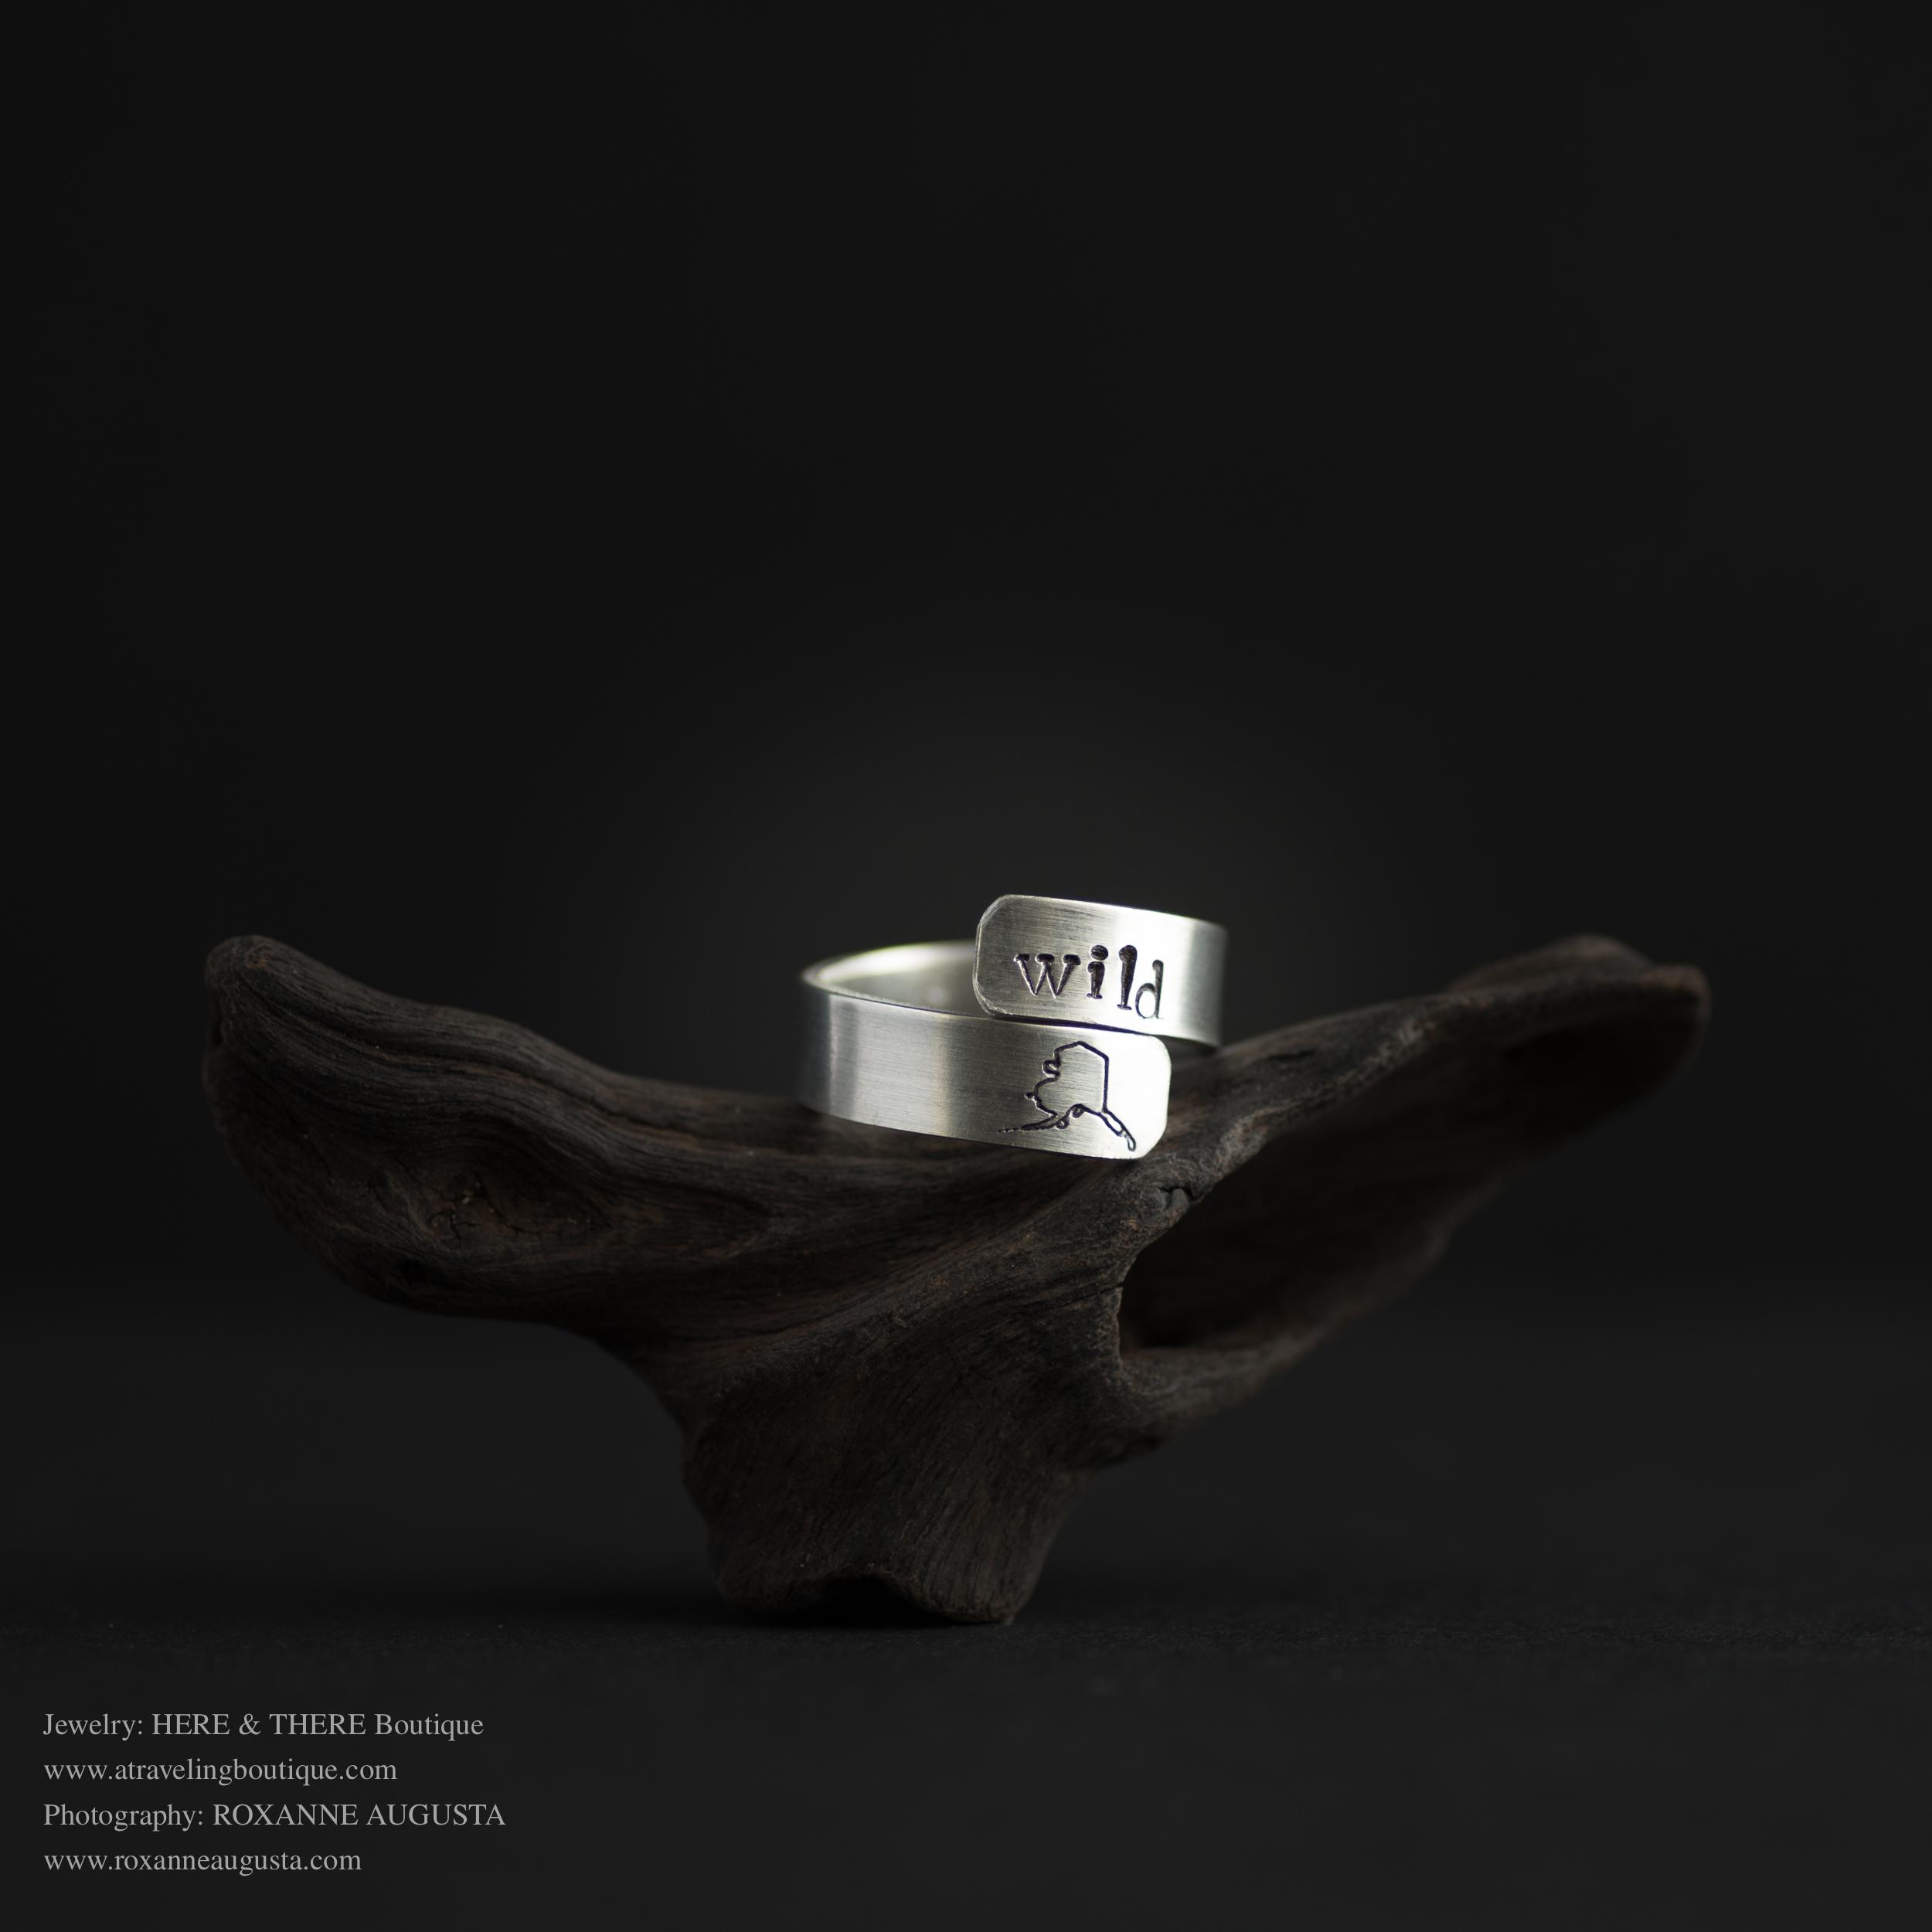 H&TJewelryProductPhotography-ROXANNEAUGUSTA.jpg